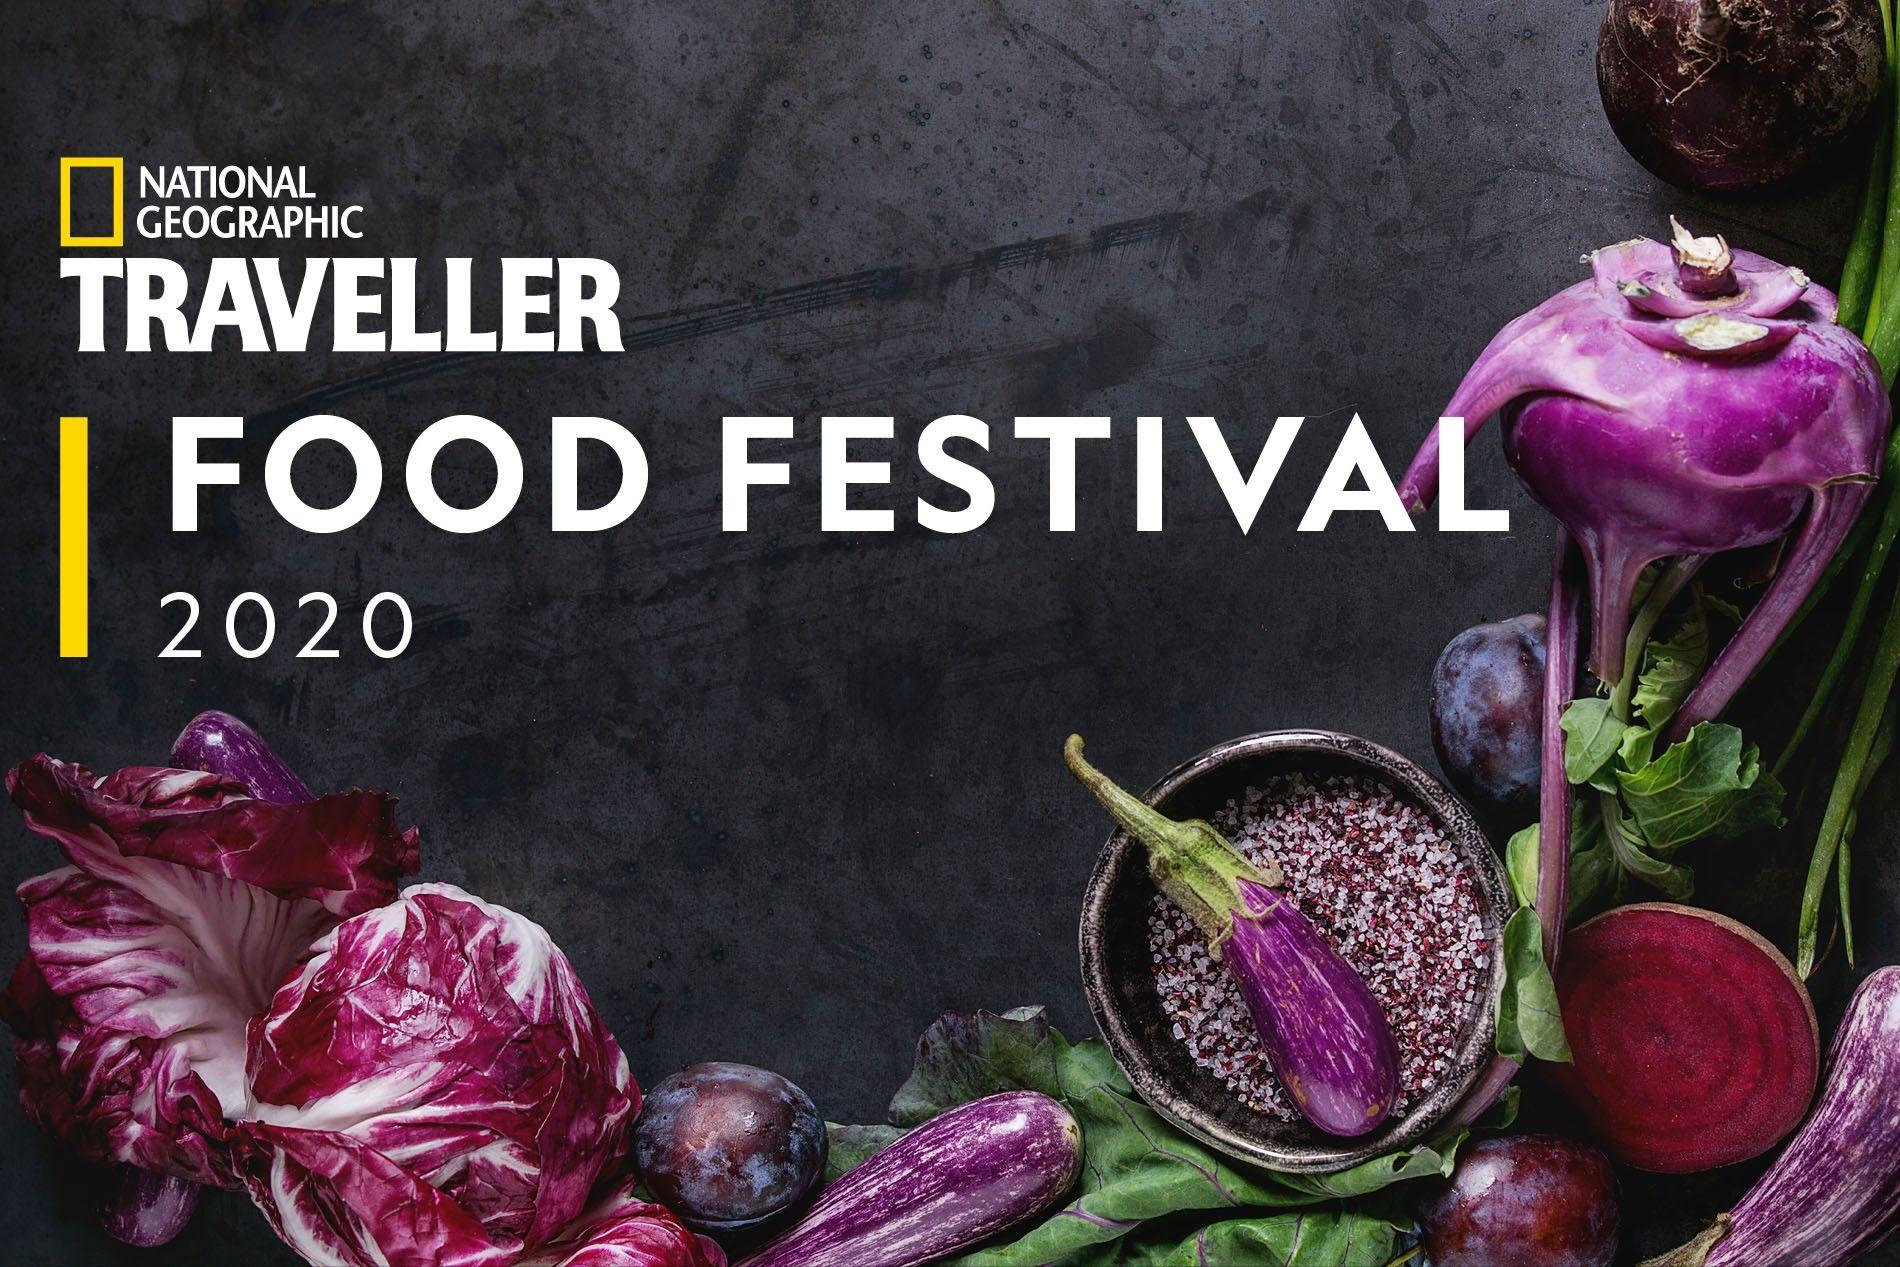 National Geographic Traveller (UK) Food Festival